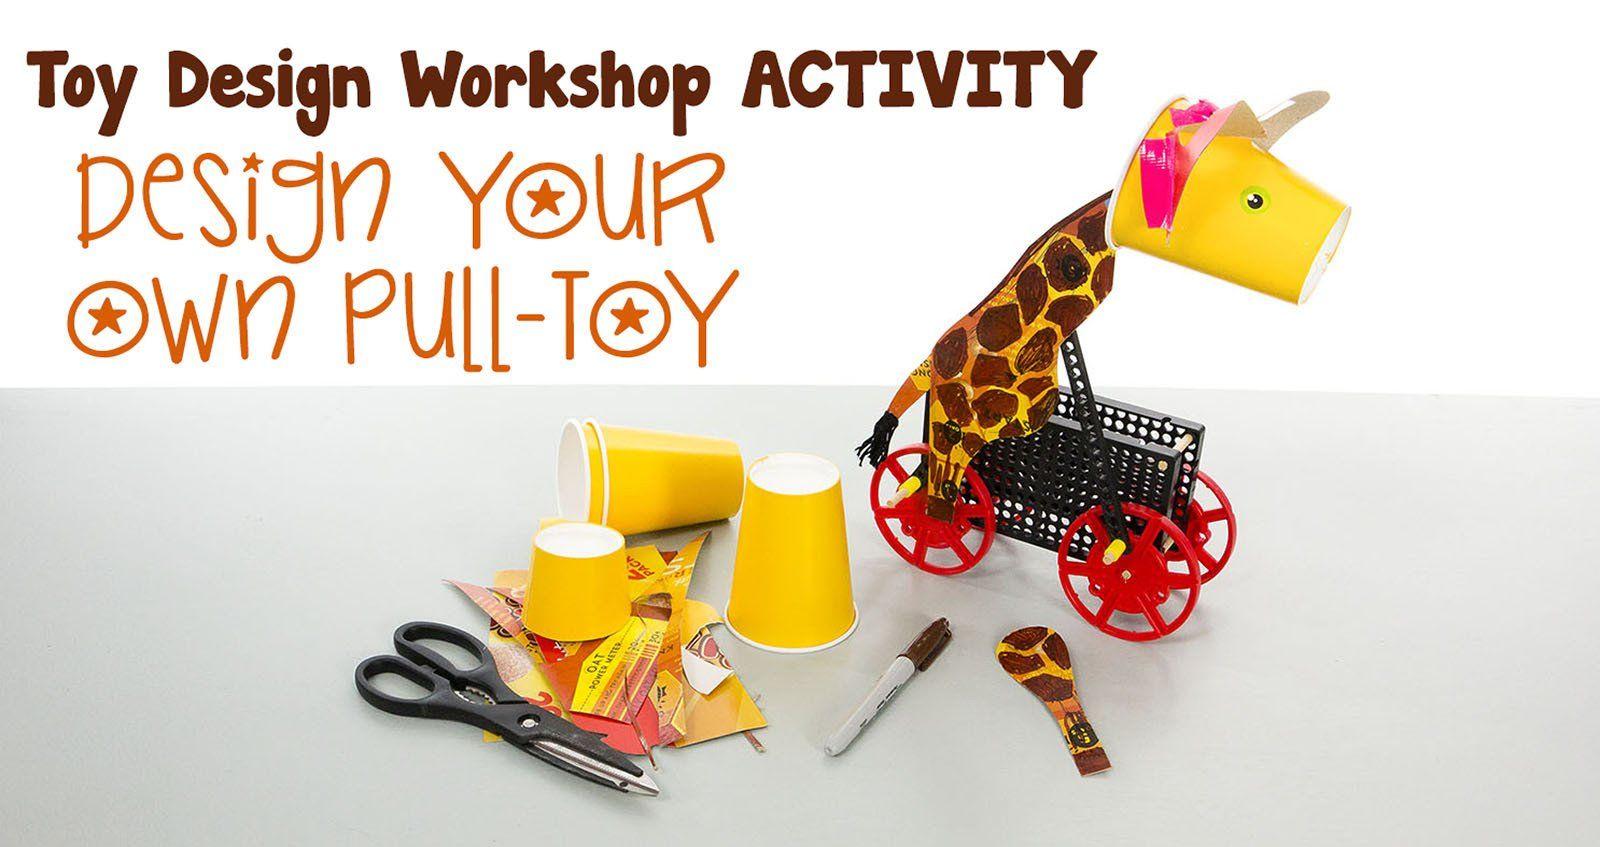 Toy Design Workshop Activity Documents